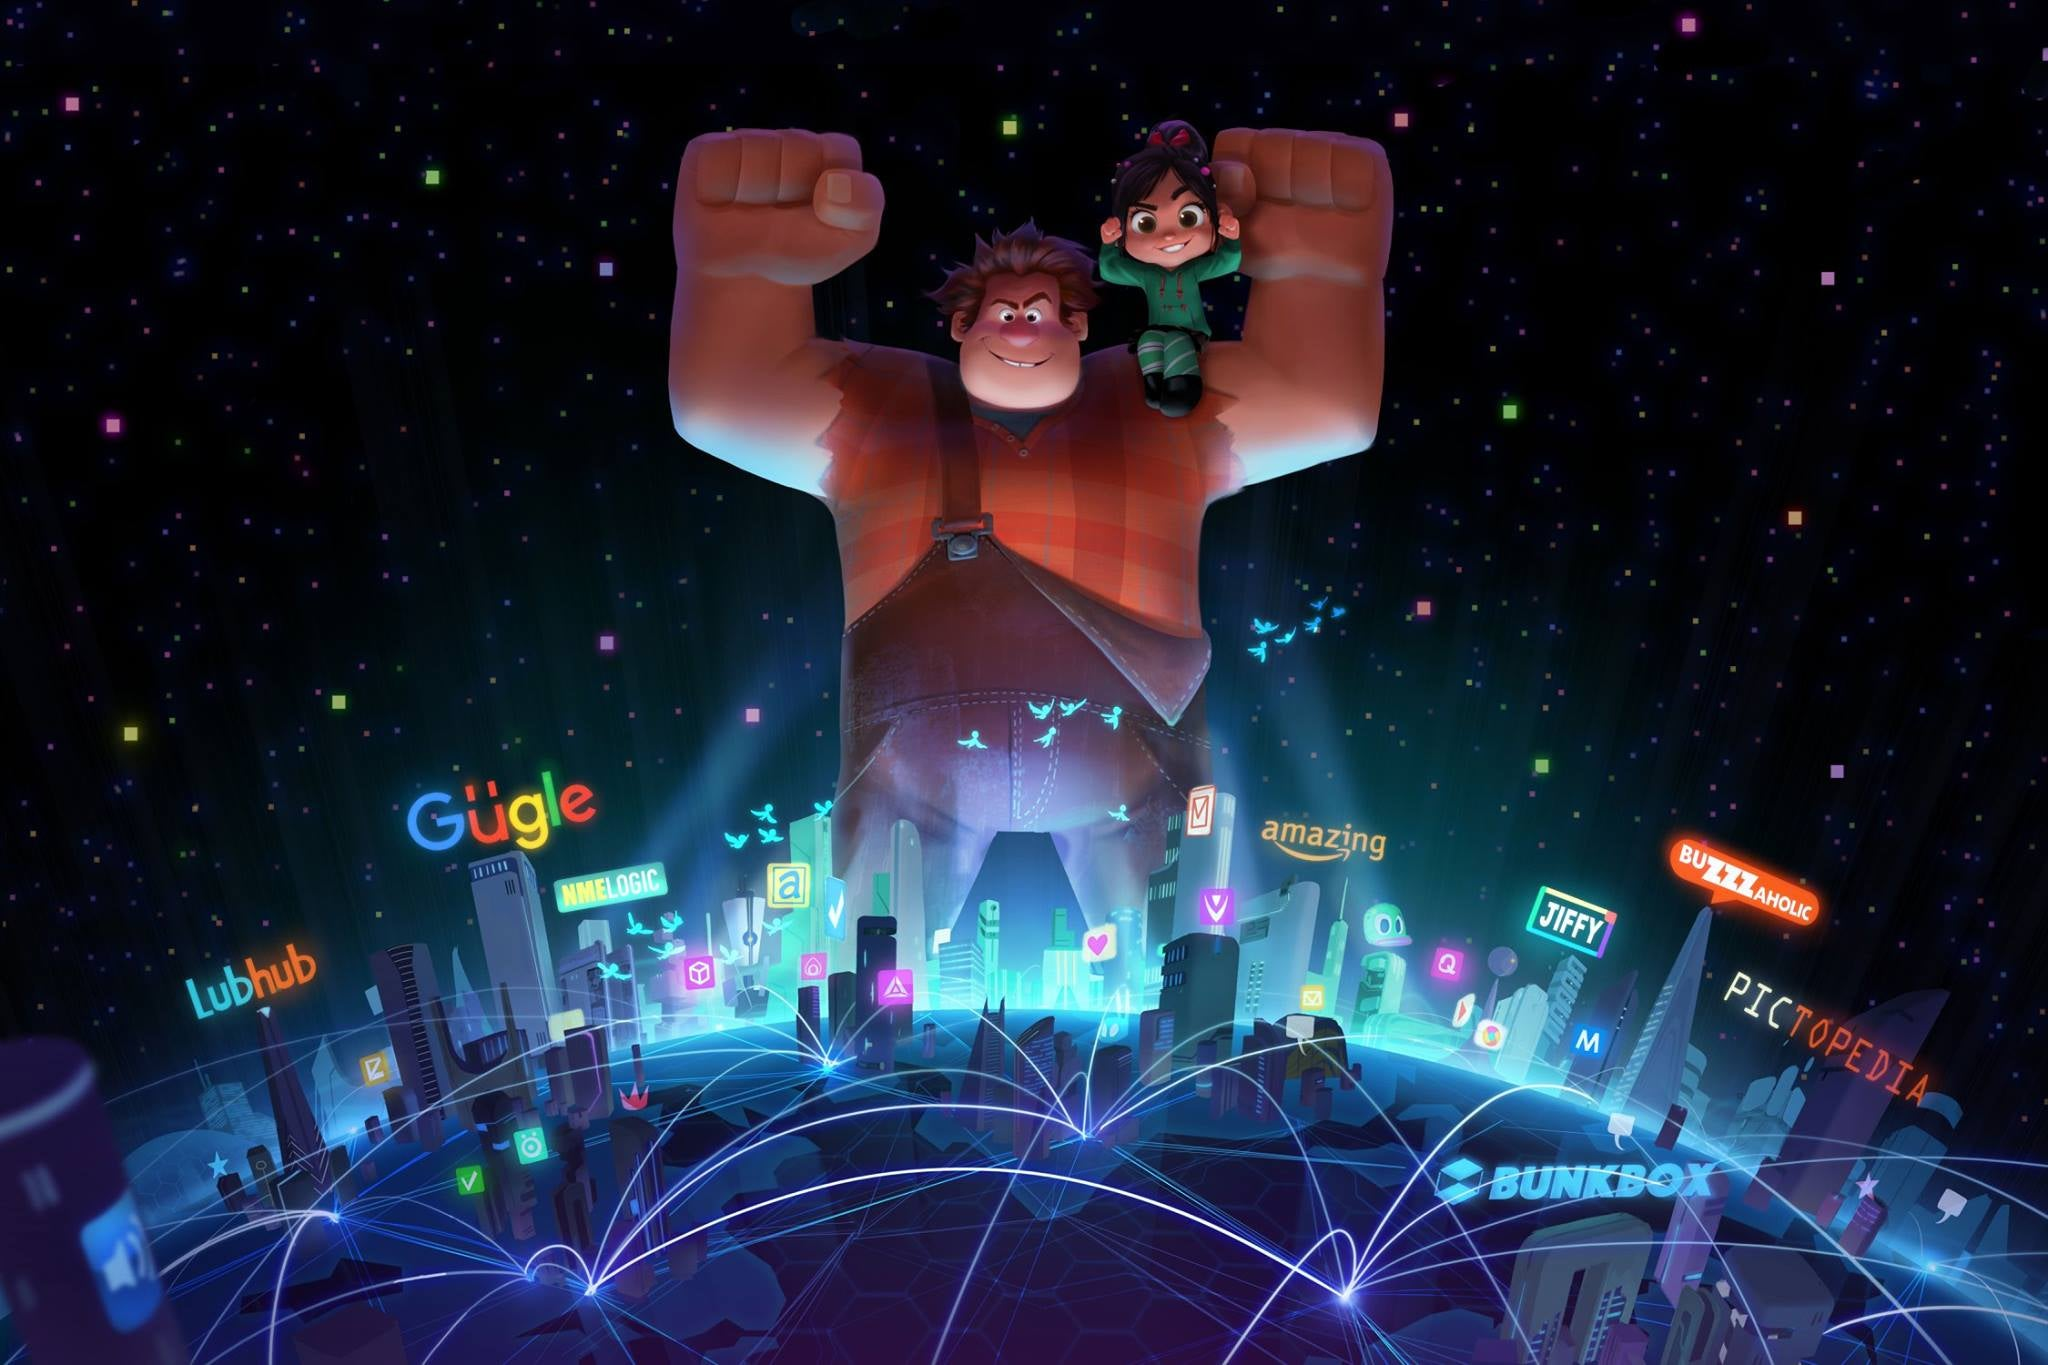 Wreck-It RalphWill Break The Internet In 2018 Sequel